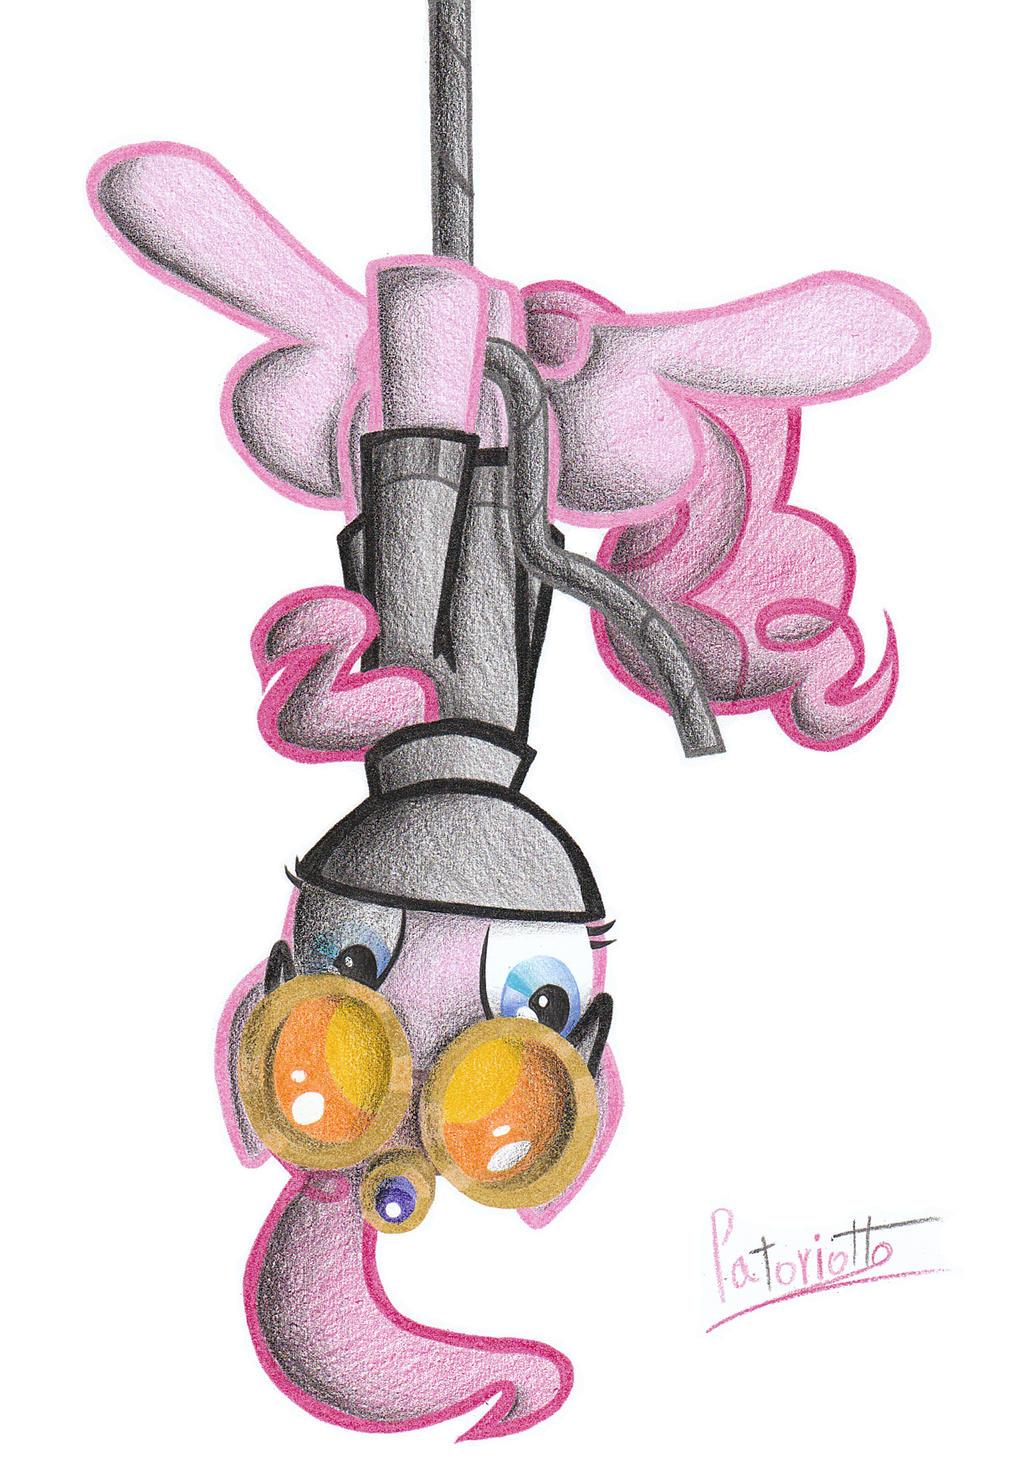 Pinkie Spy by Patoriotto